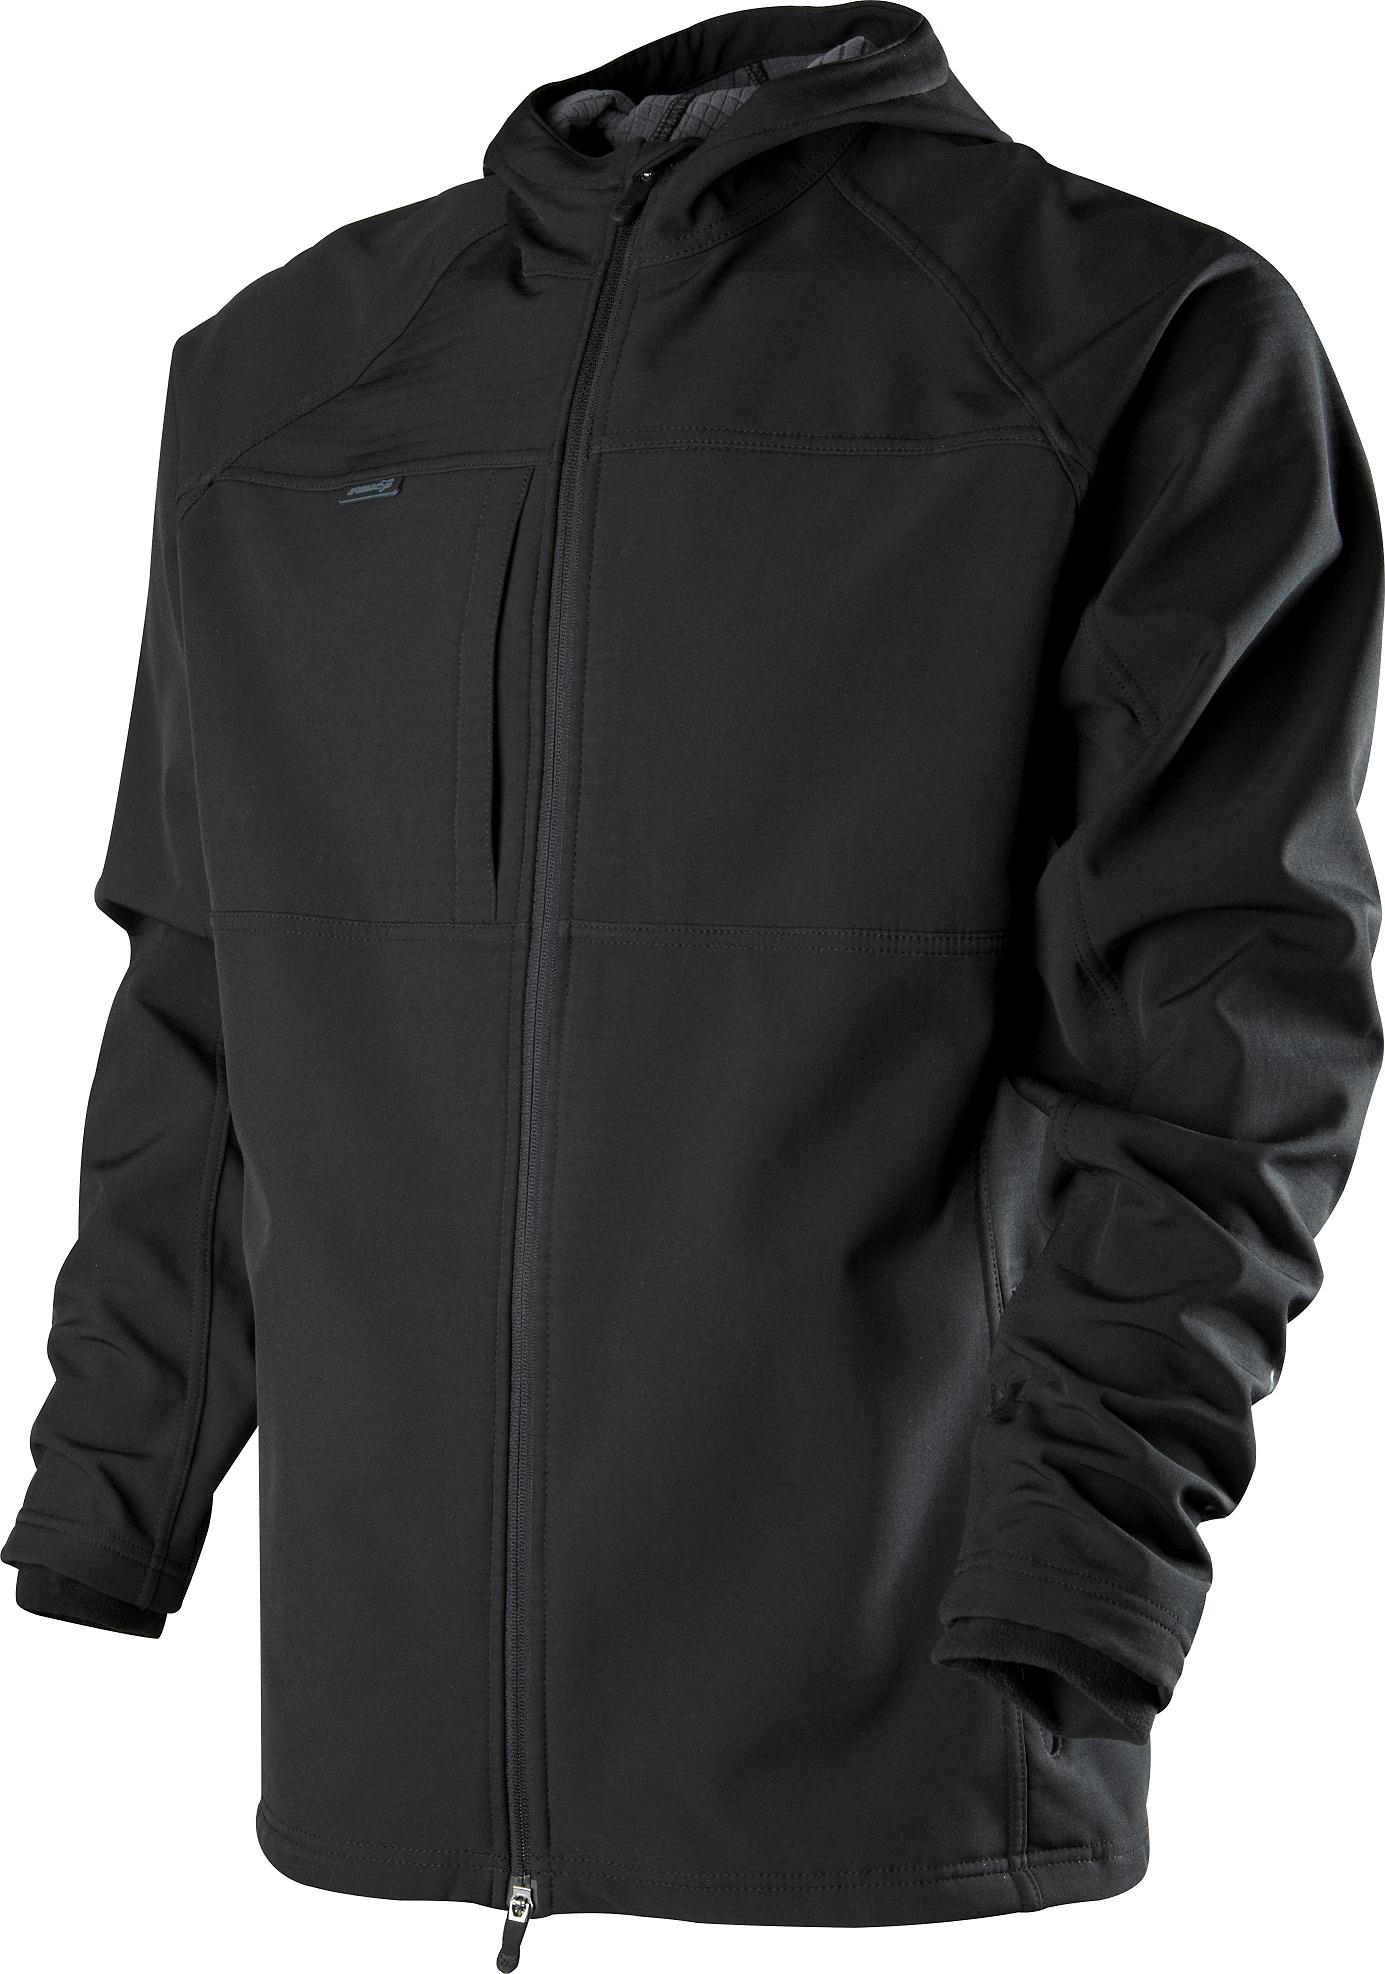 ���������� FOX Bionic Breakaway Jacket Black M 02228-001-M